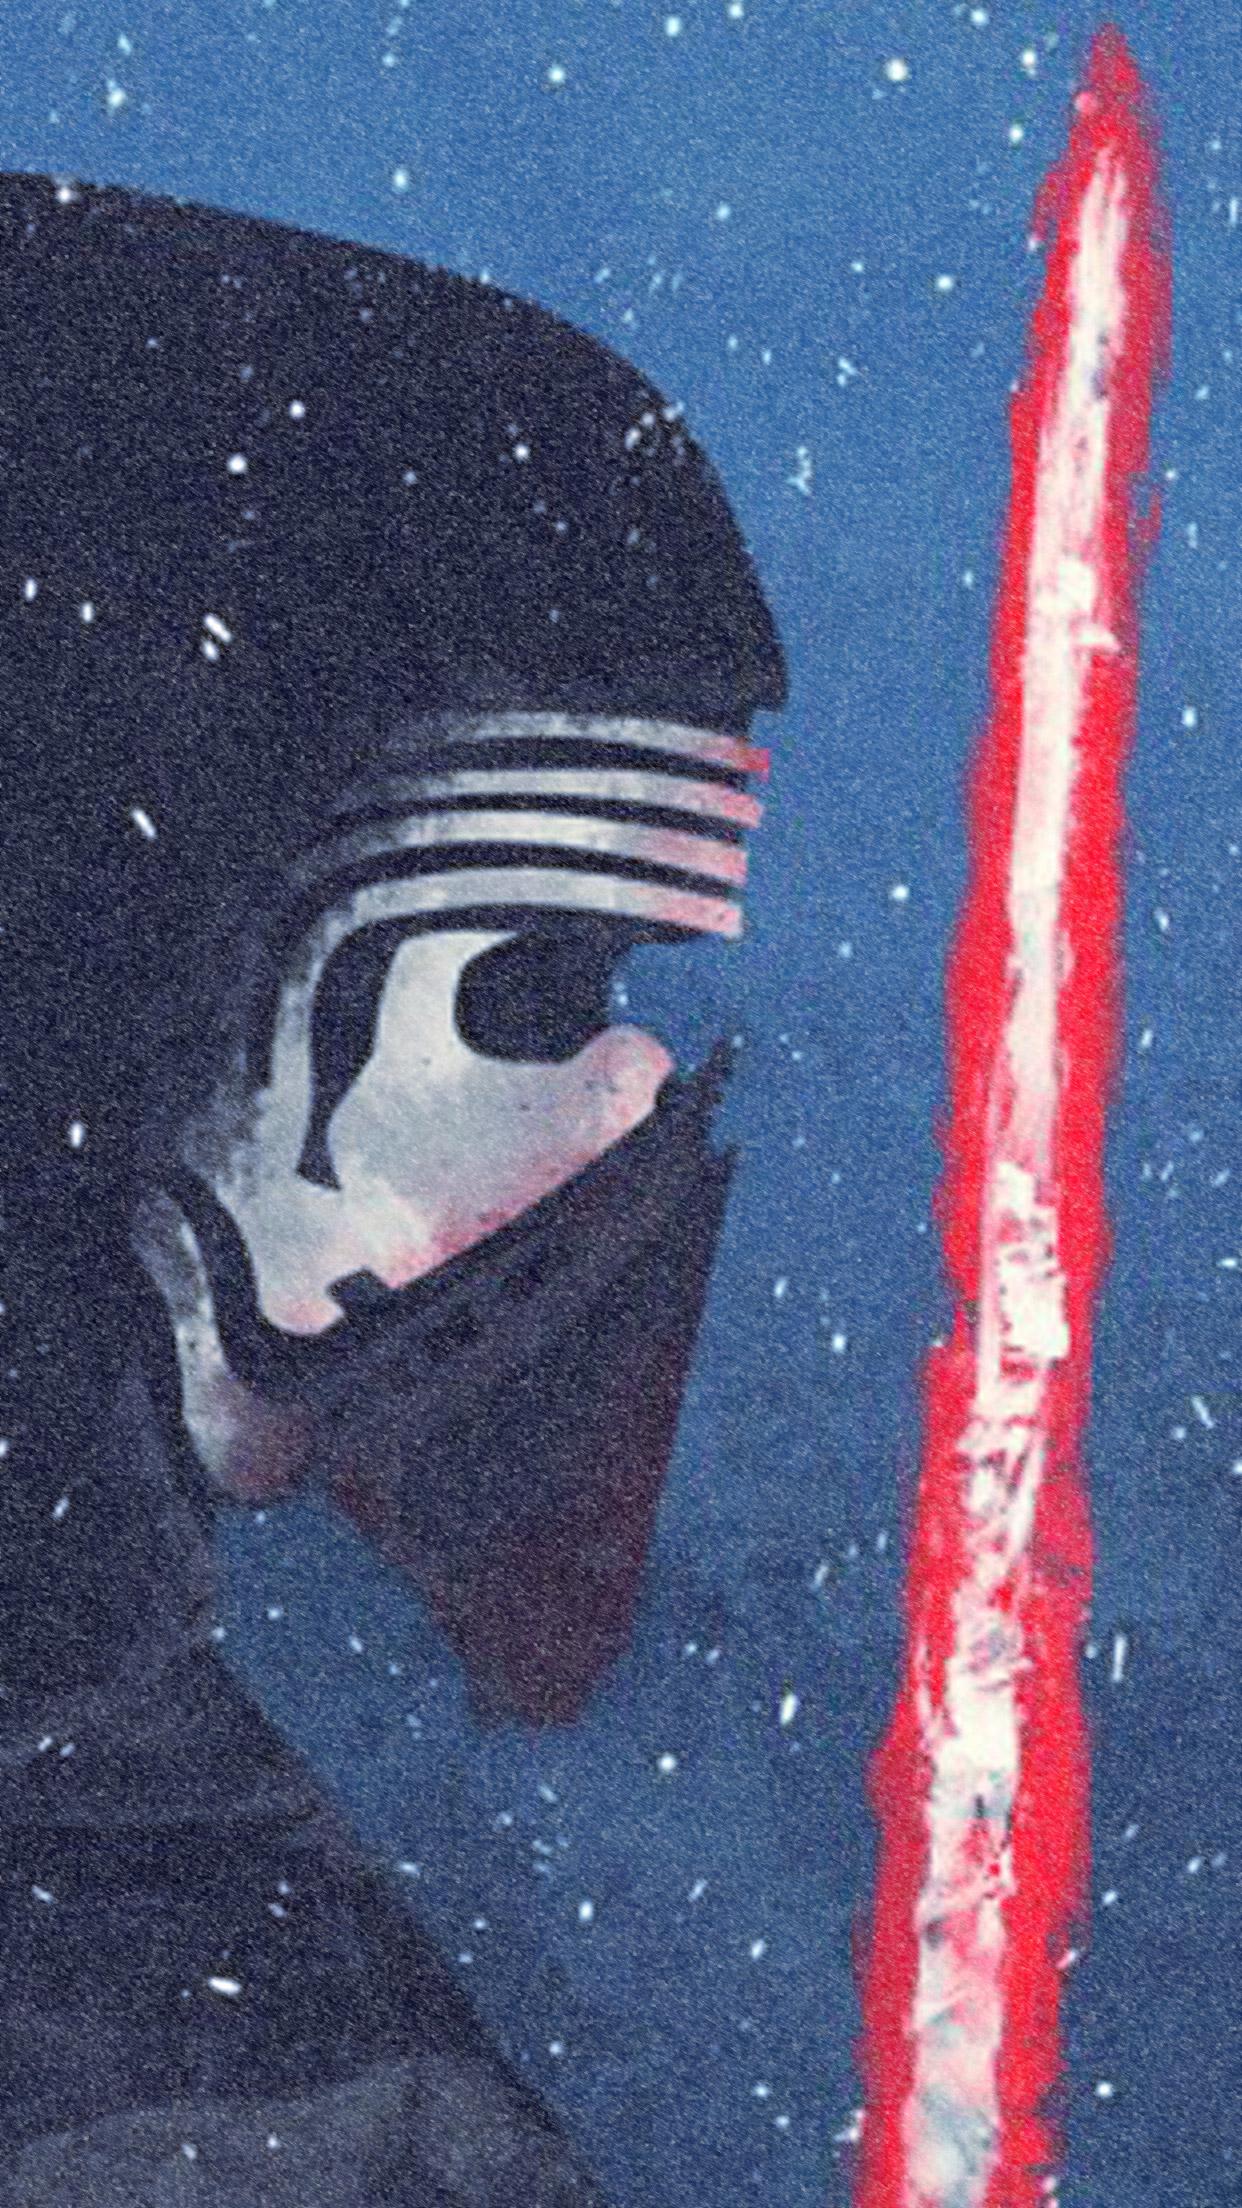 Star-Wars-The-Force-Awakens-Kylo-Ren-Wallpaper-iDeviceArt